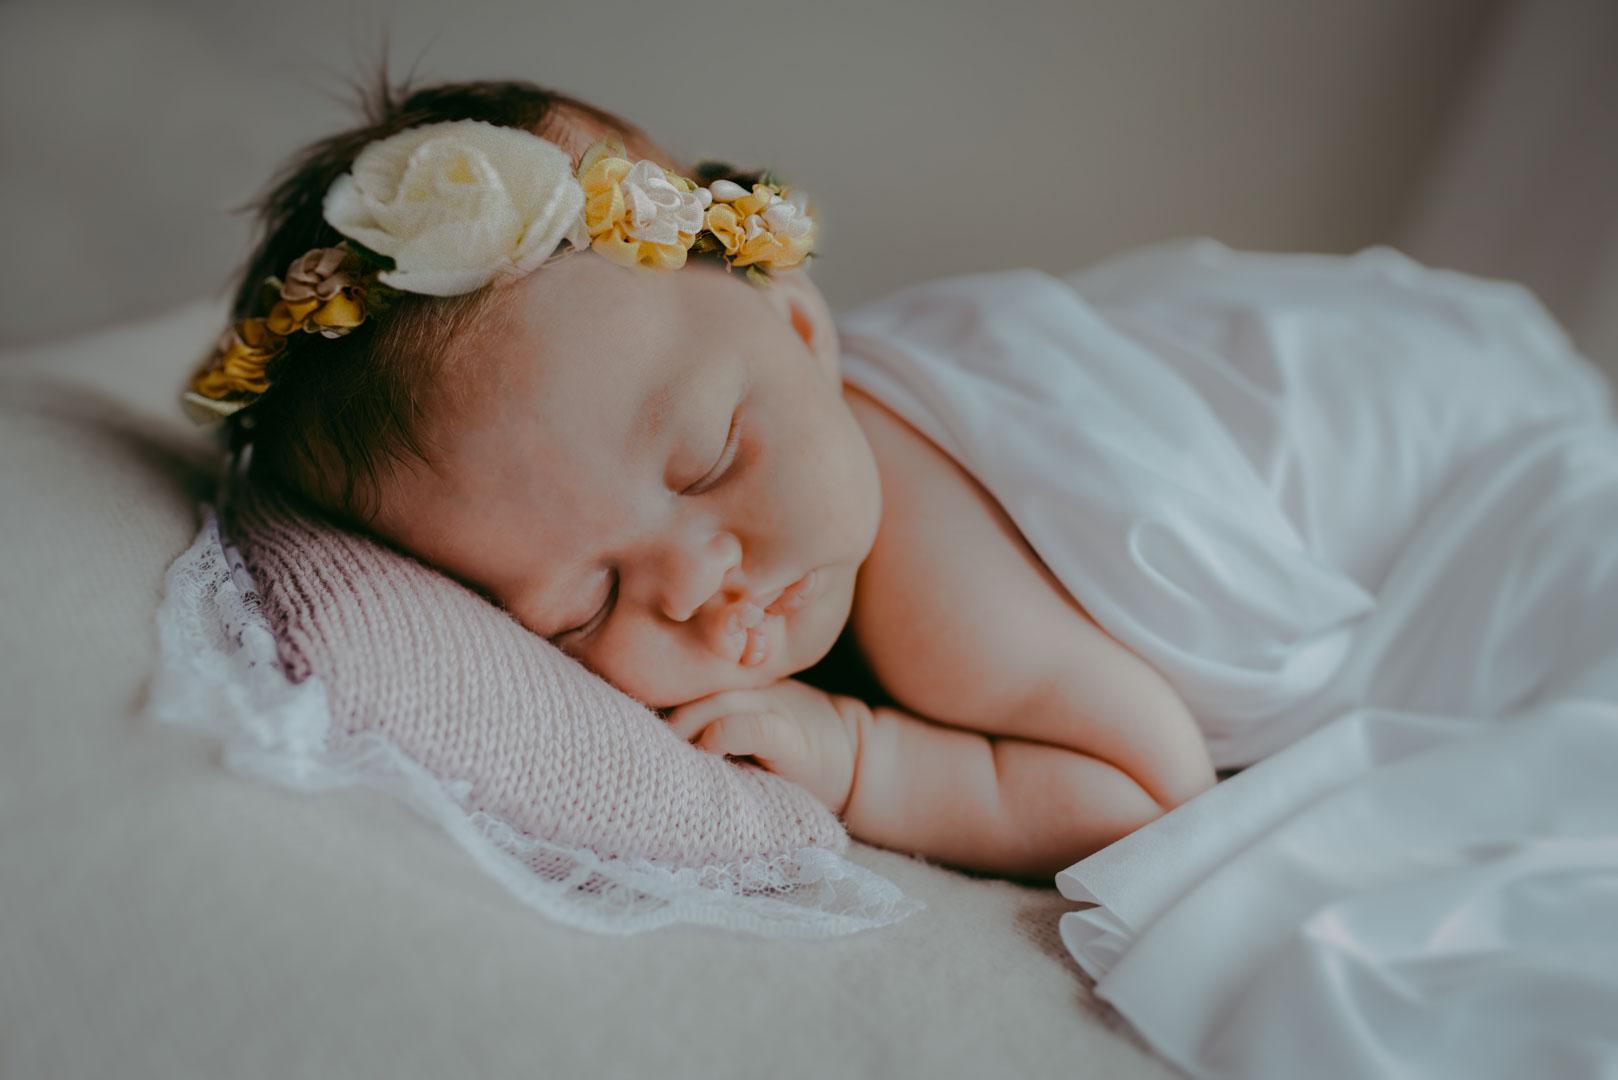 Nela – month old girl